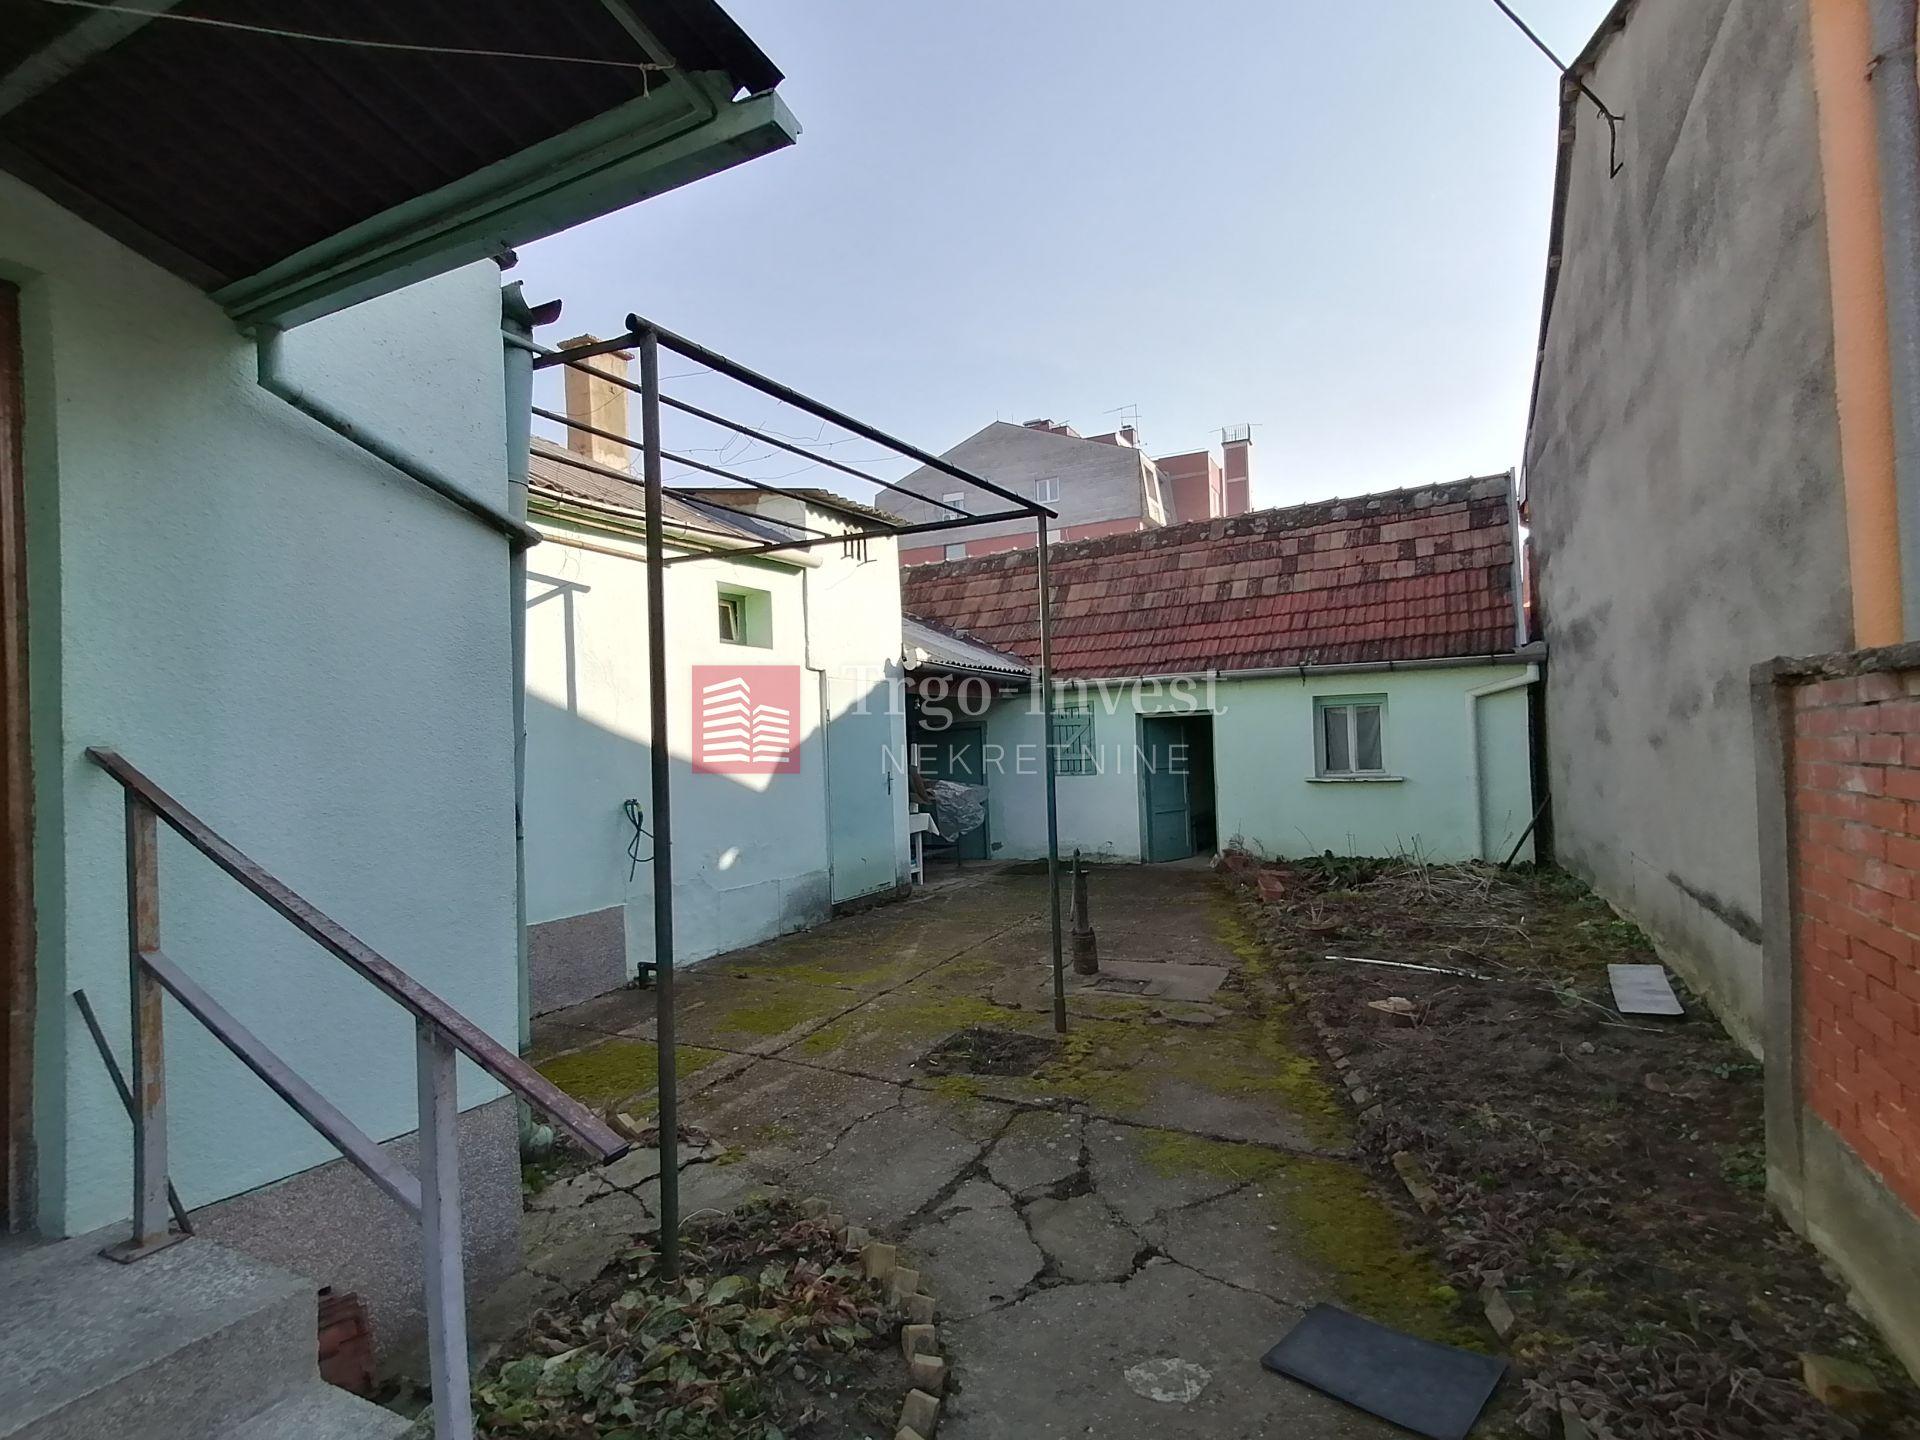 FRANJE KUHAČA (JELAS), Sl.Brod, prizemnica 60m2 + dvorišna, ok.310m2